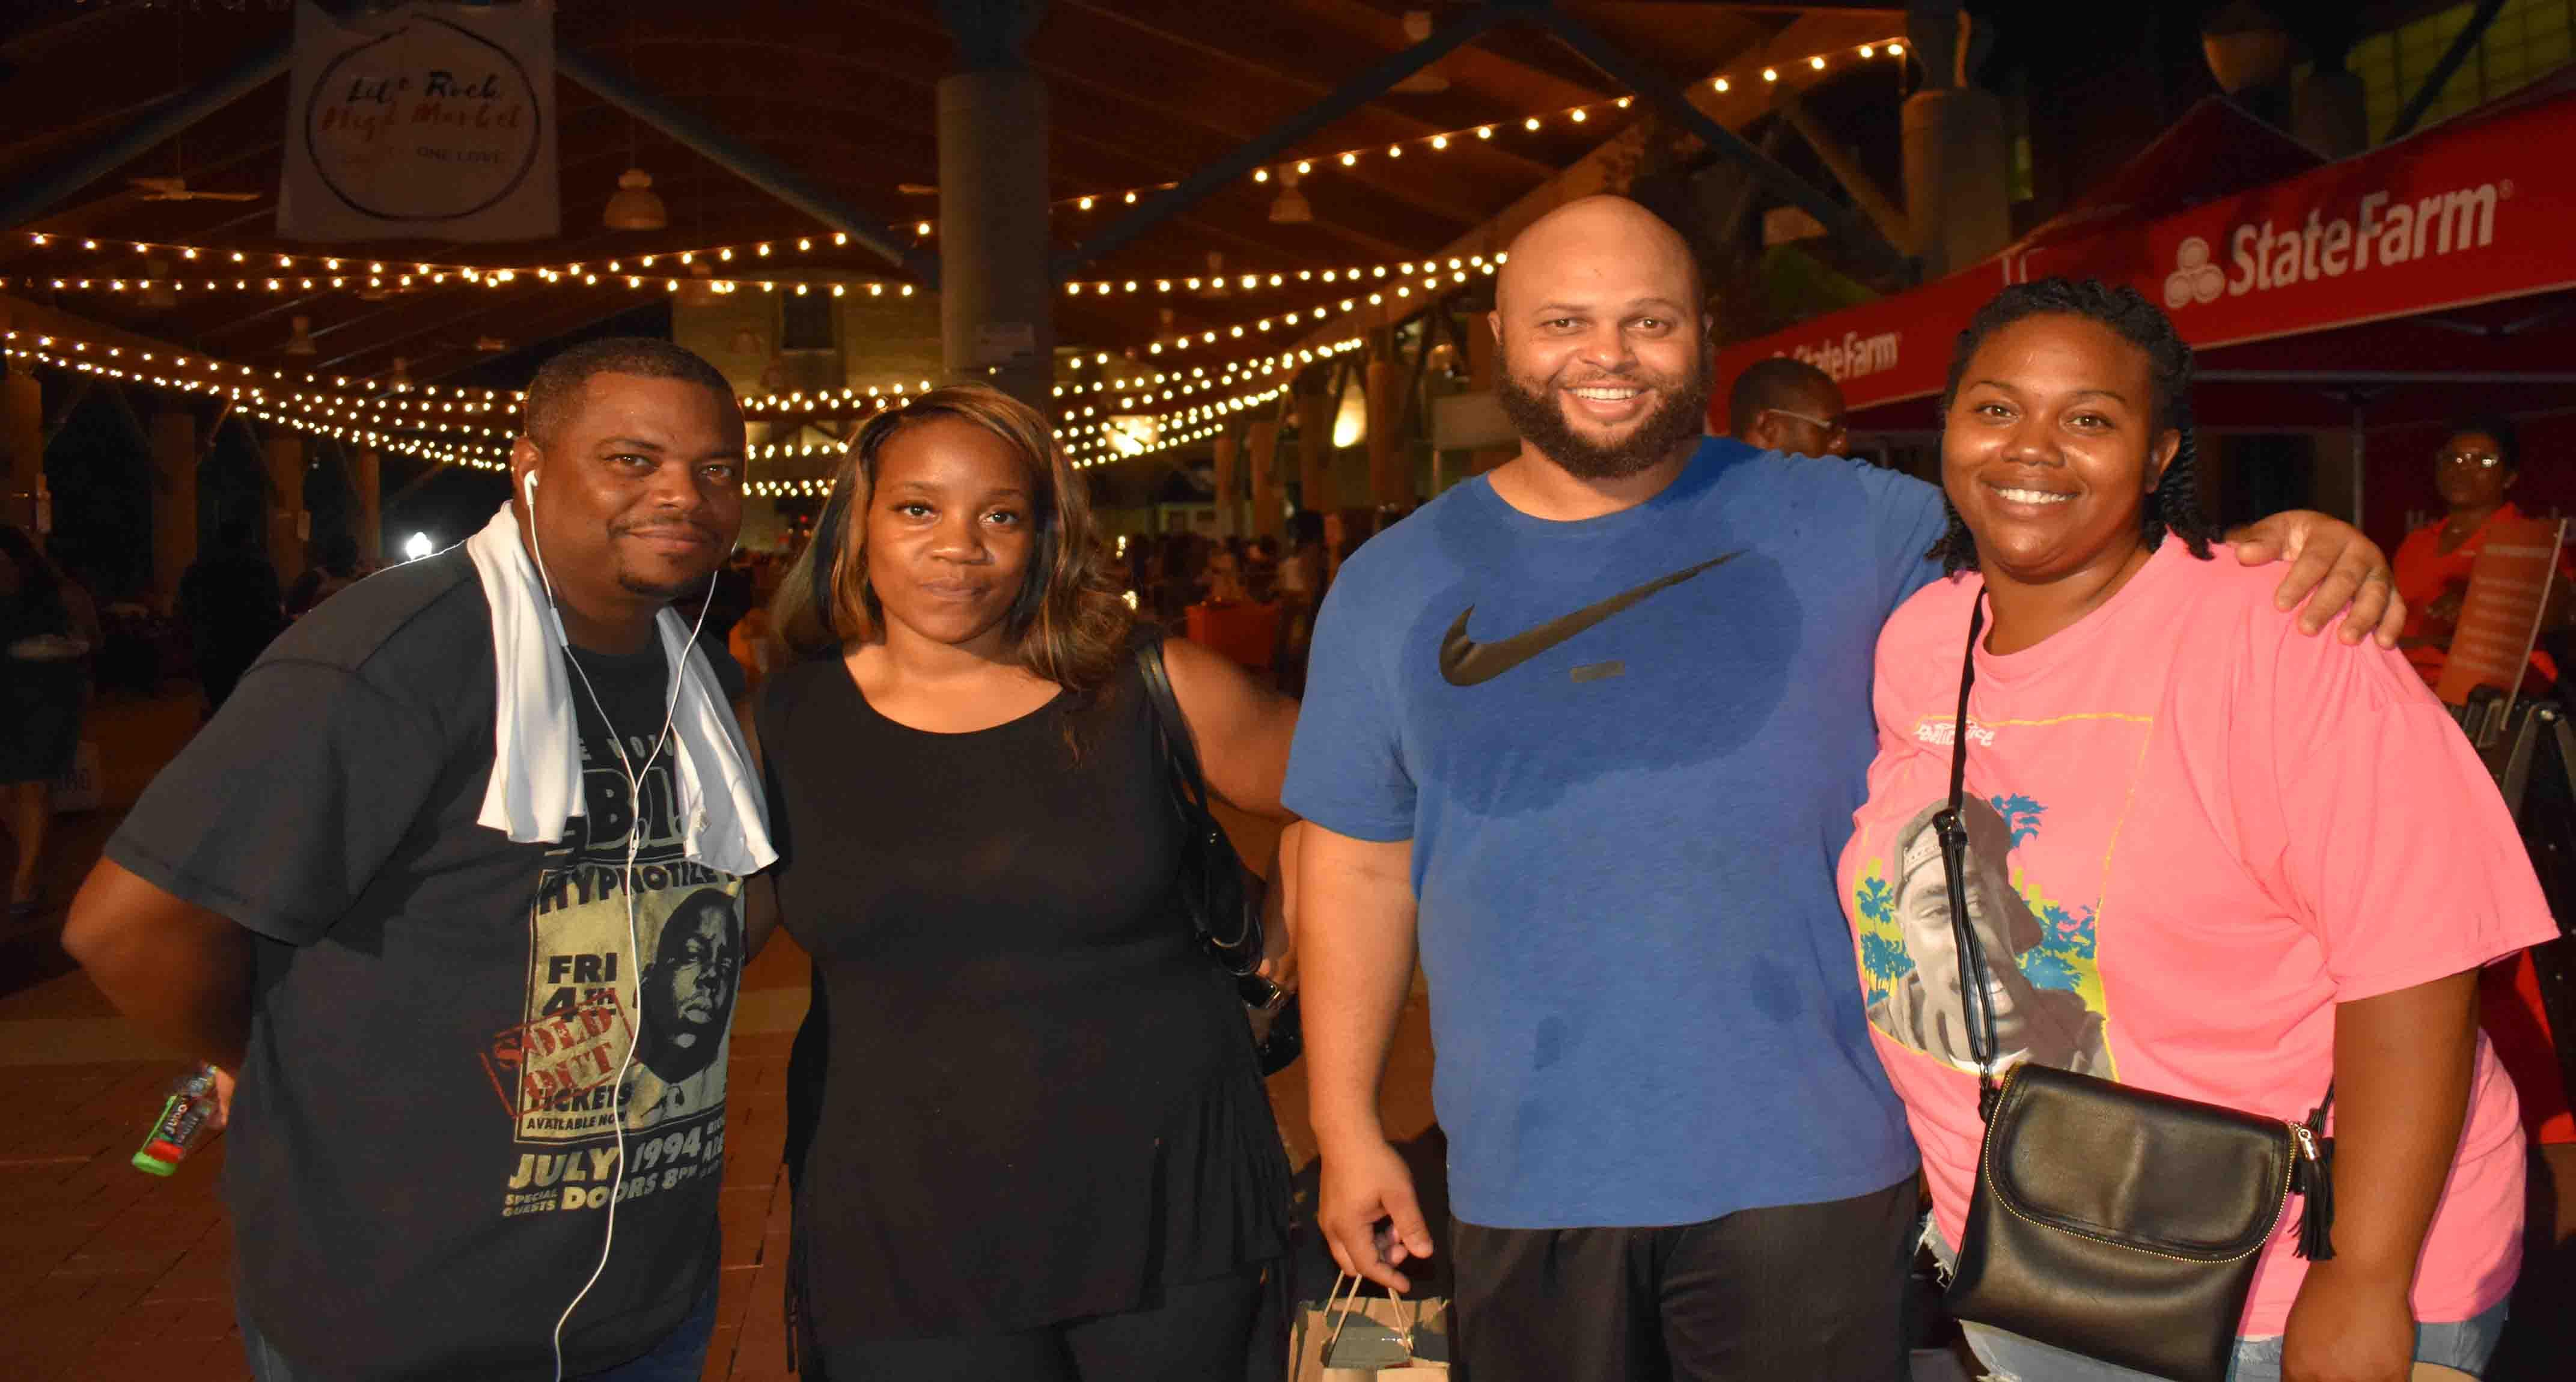 Ray & Vanyelle Lewis, Xavier & Sarita Hendrix